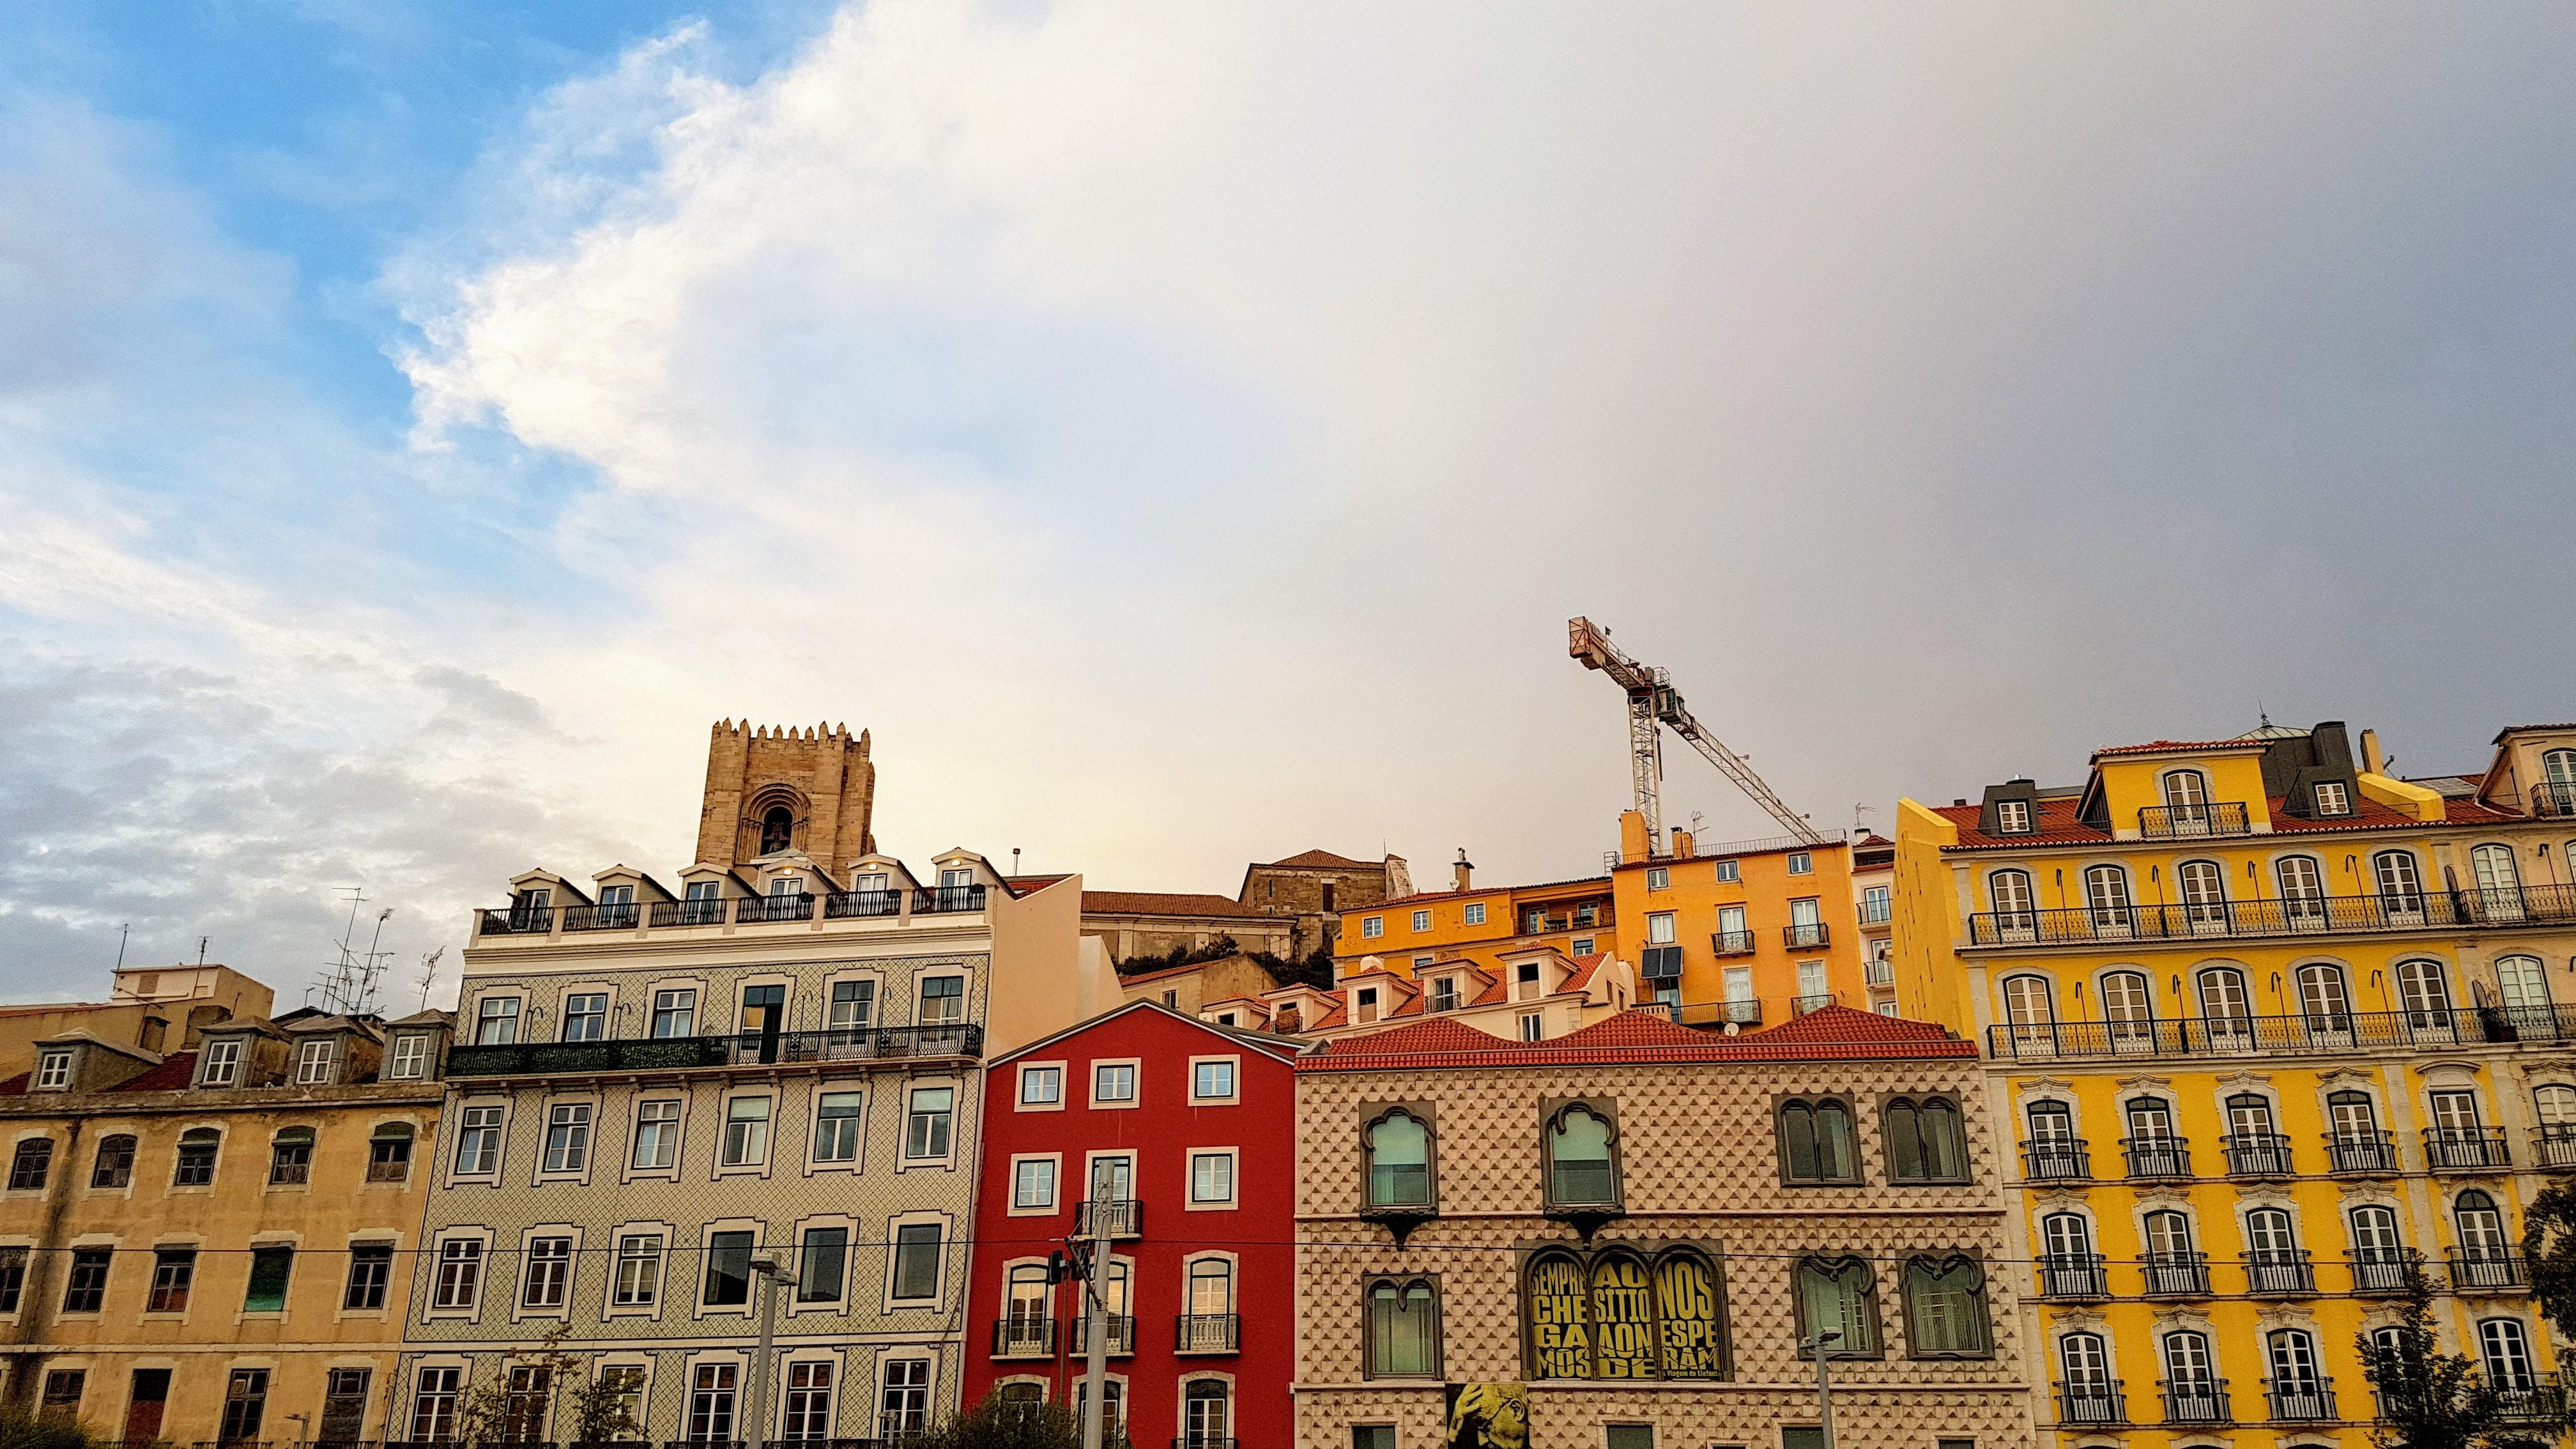 Lisboa à prova de sismos? Tudo sobre o Programa ReSist